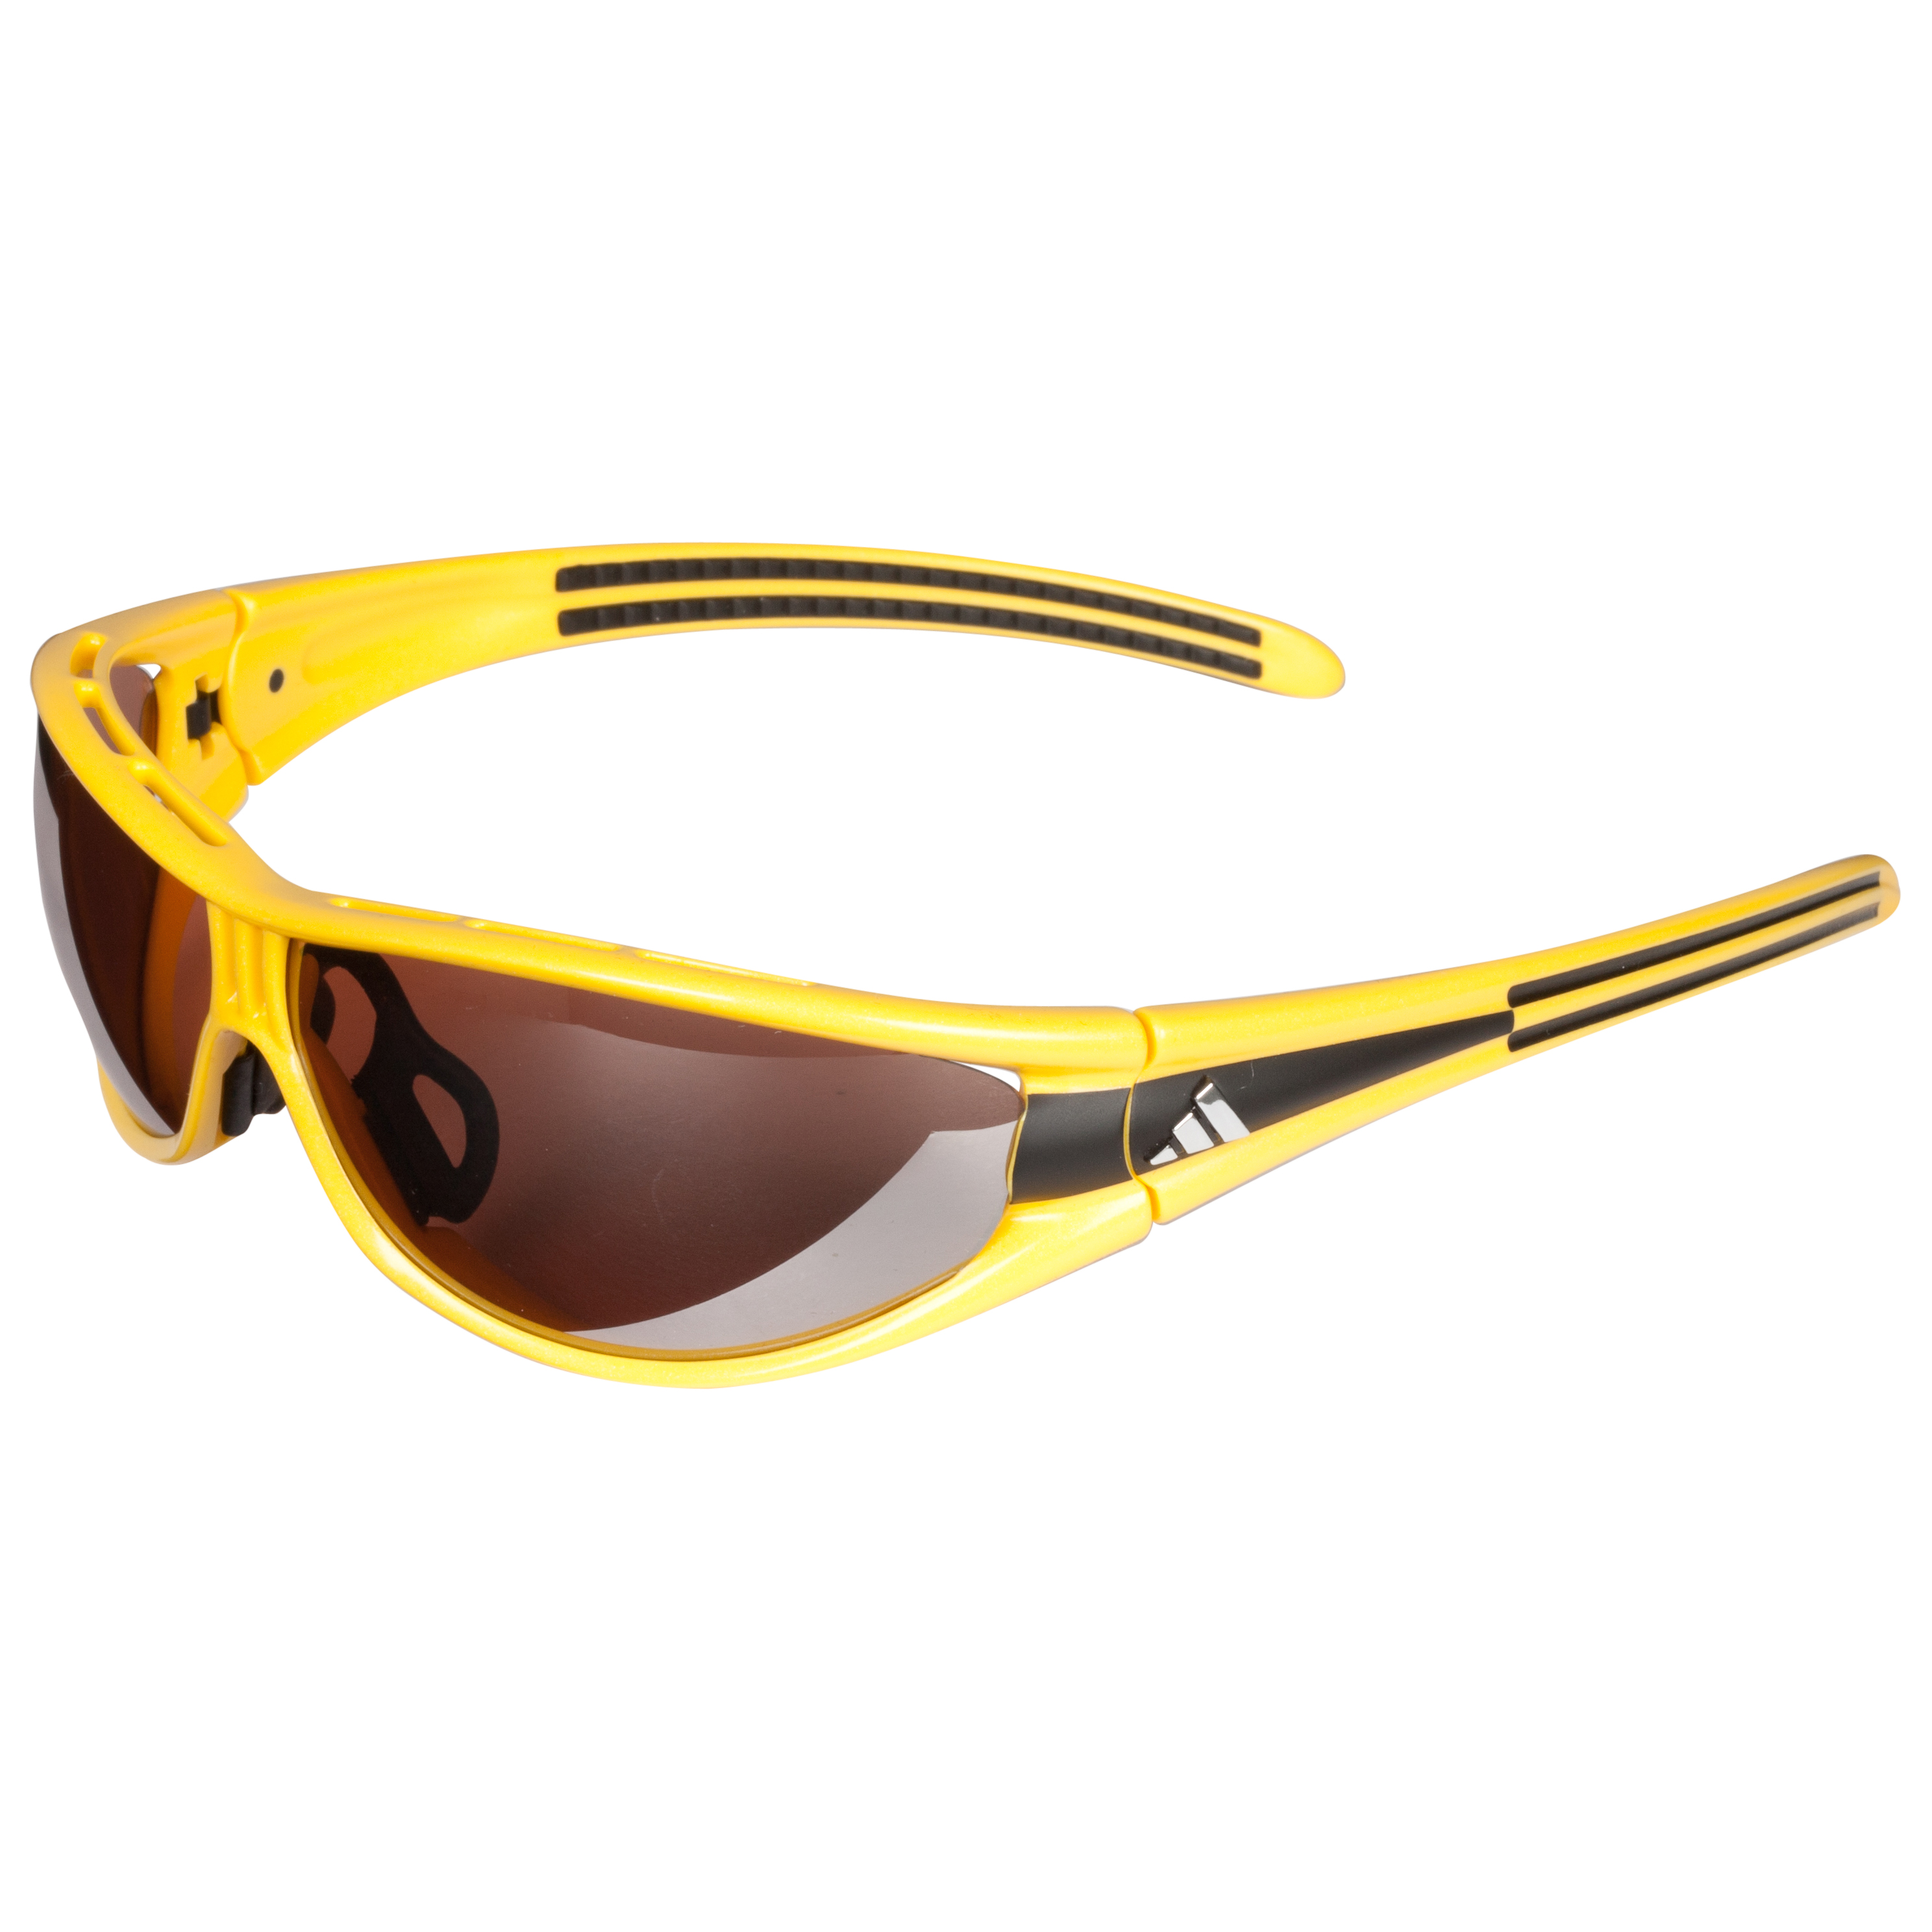 Adidas Evil Eye Sunglasses - Yellow